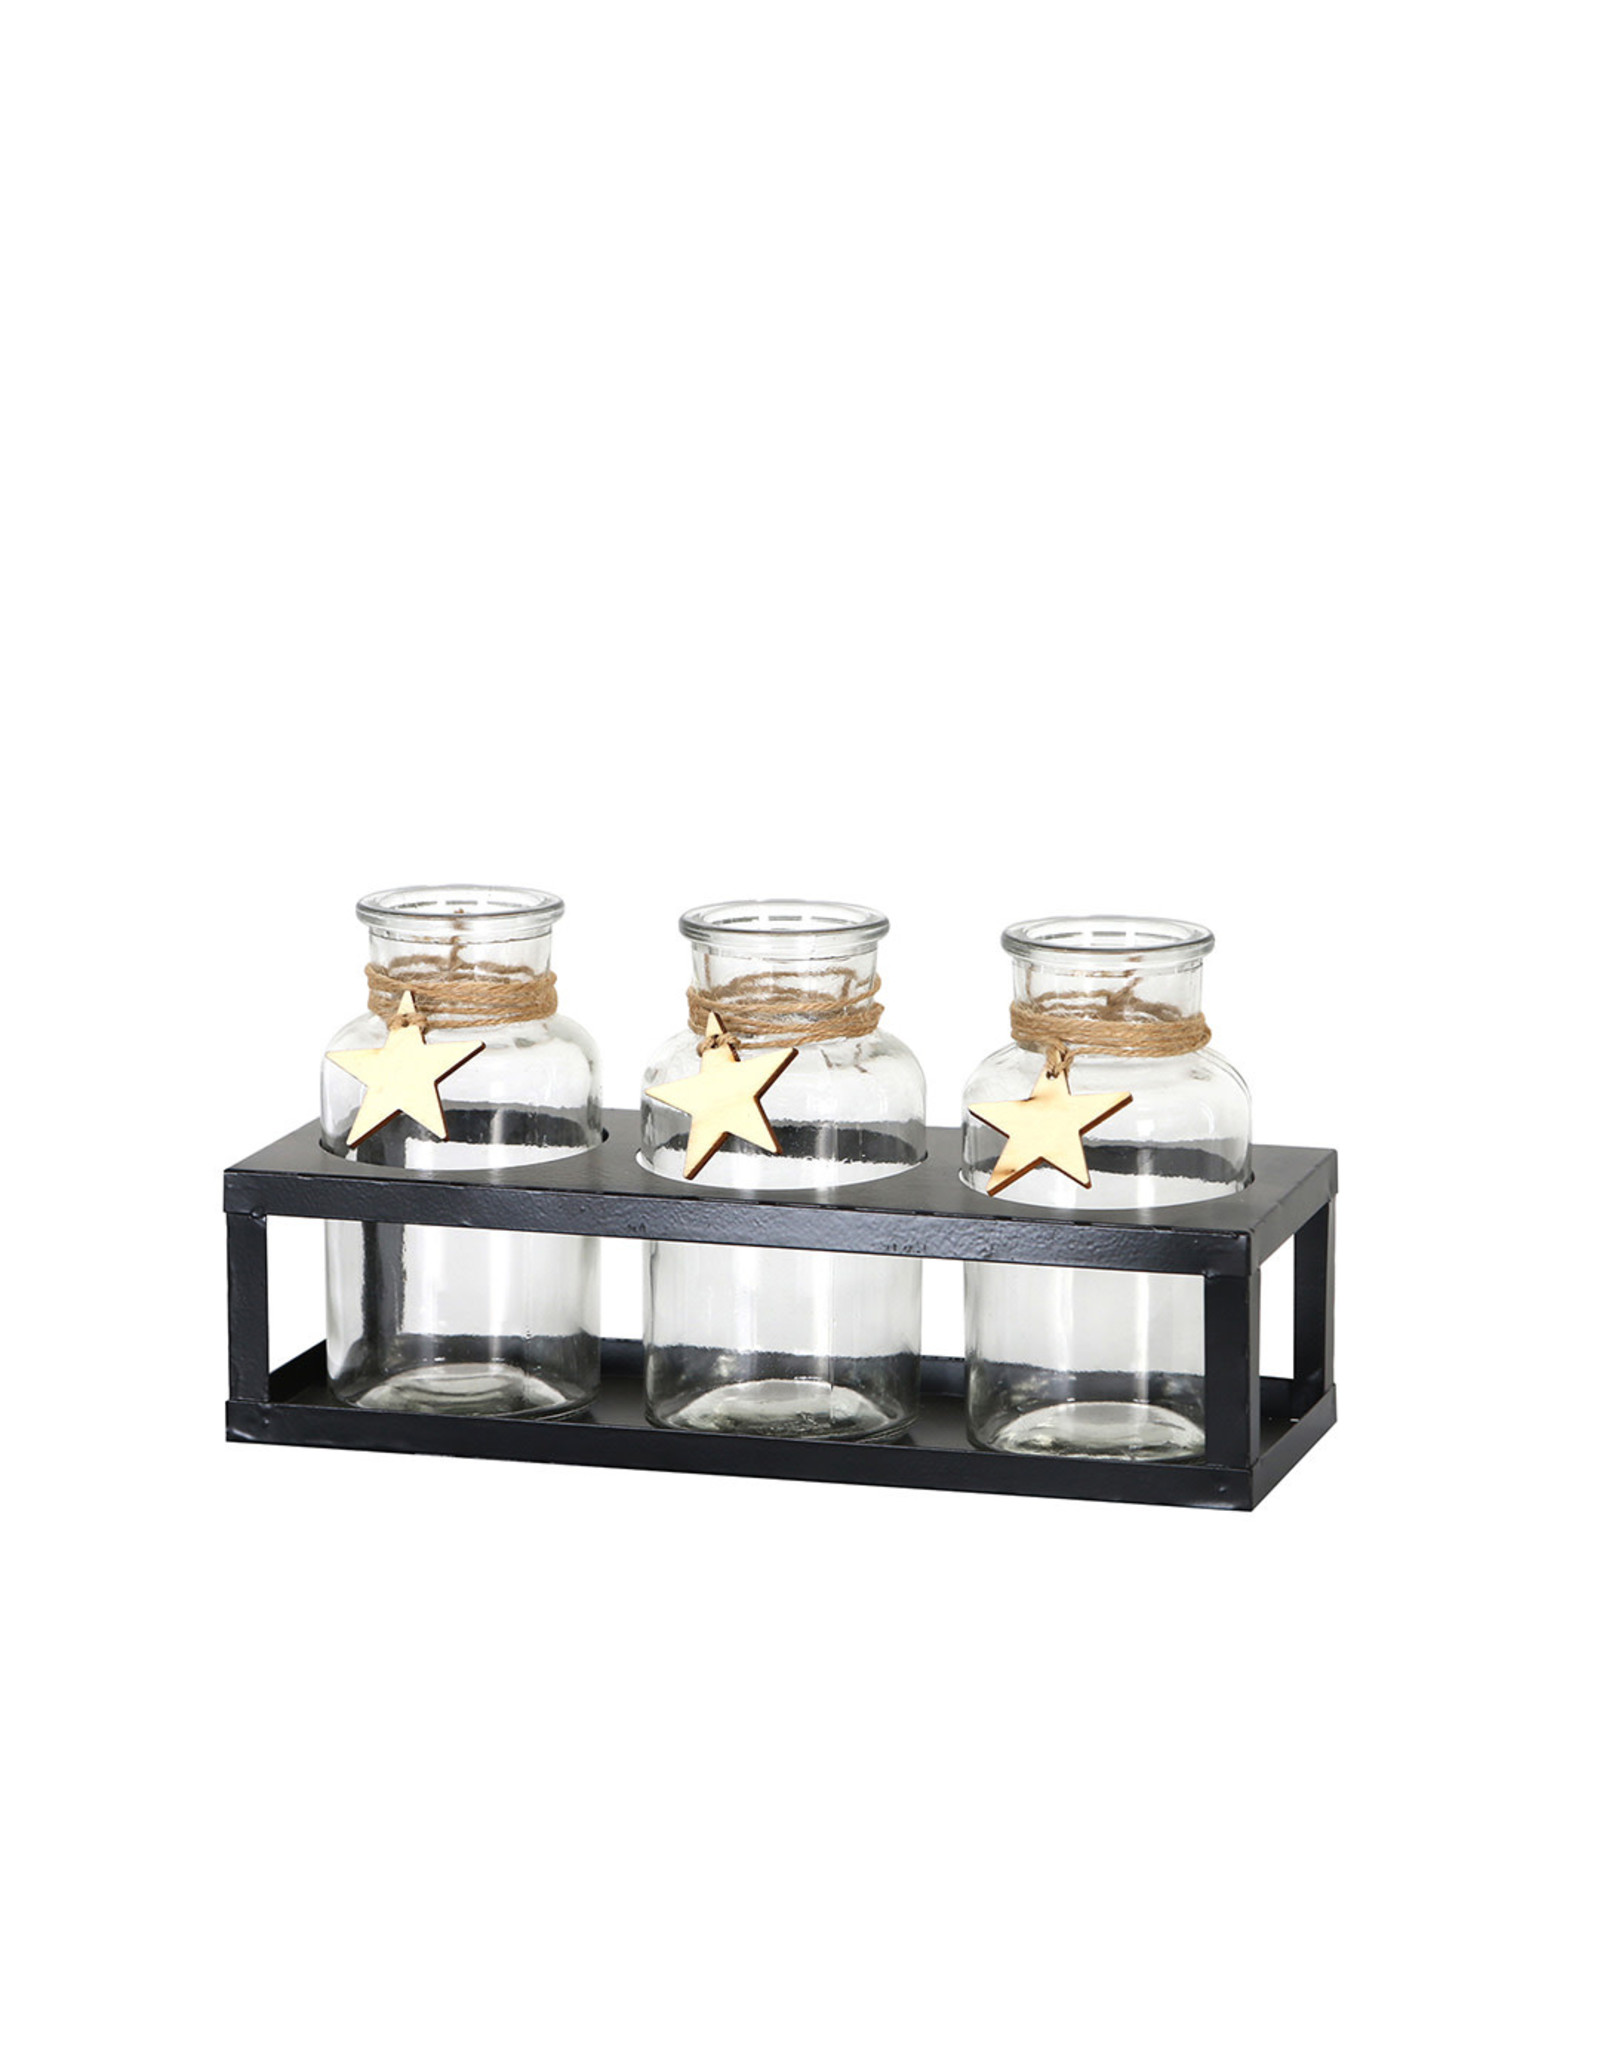 Dijk Bottles in stand glass/metal black 25x9x13cm